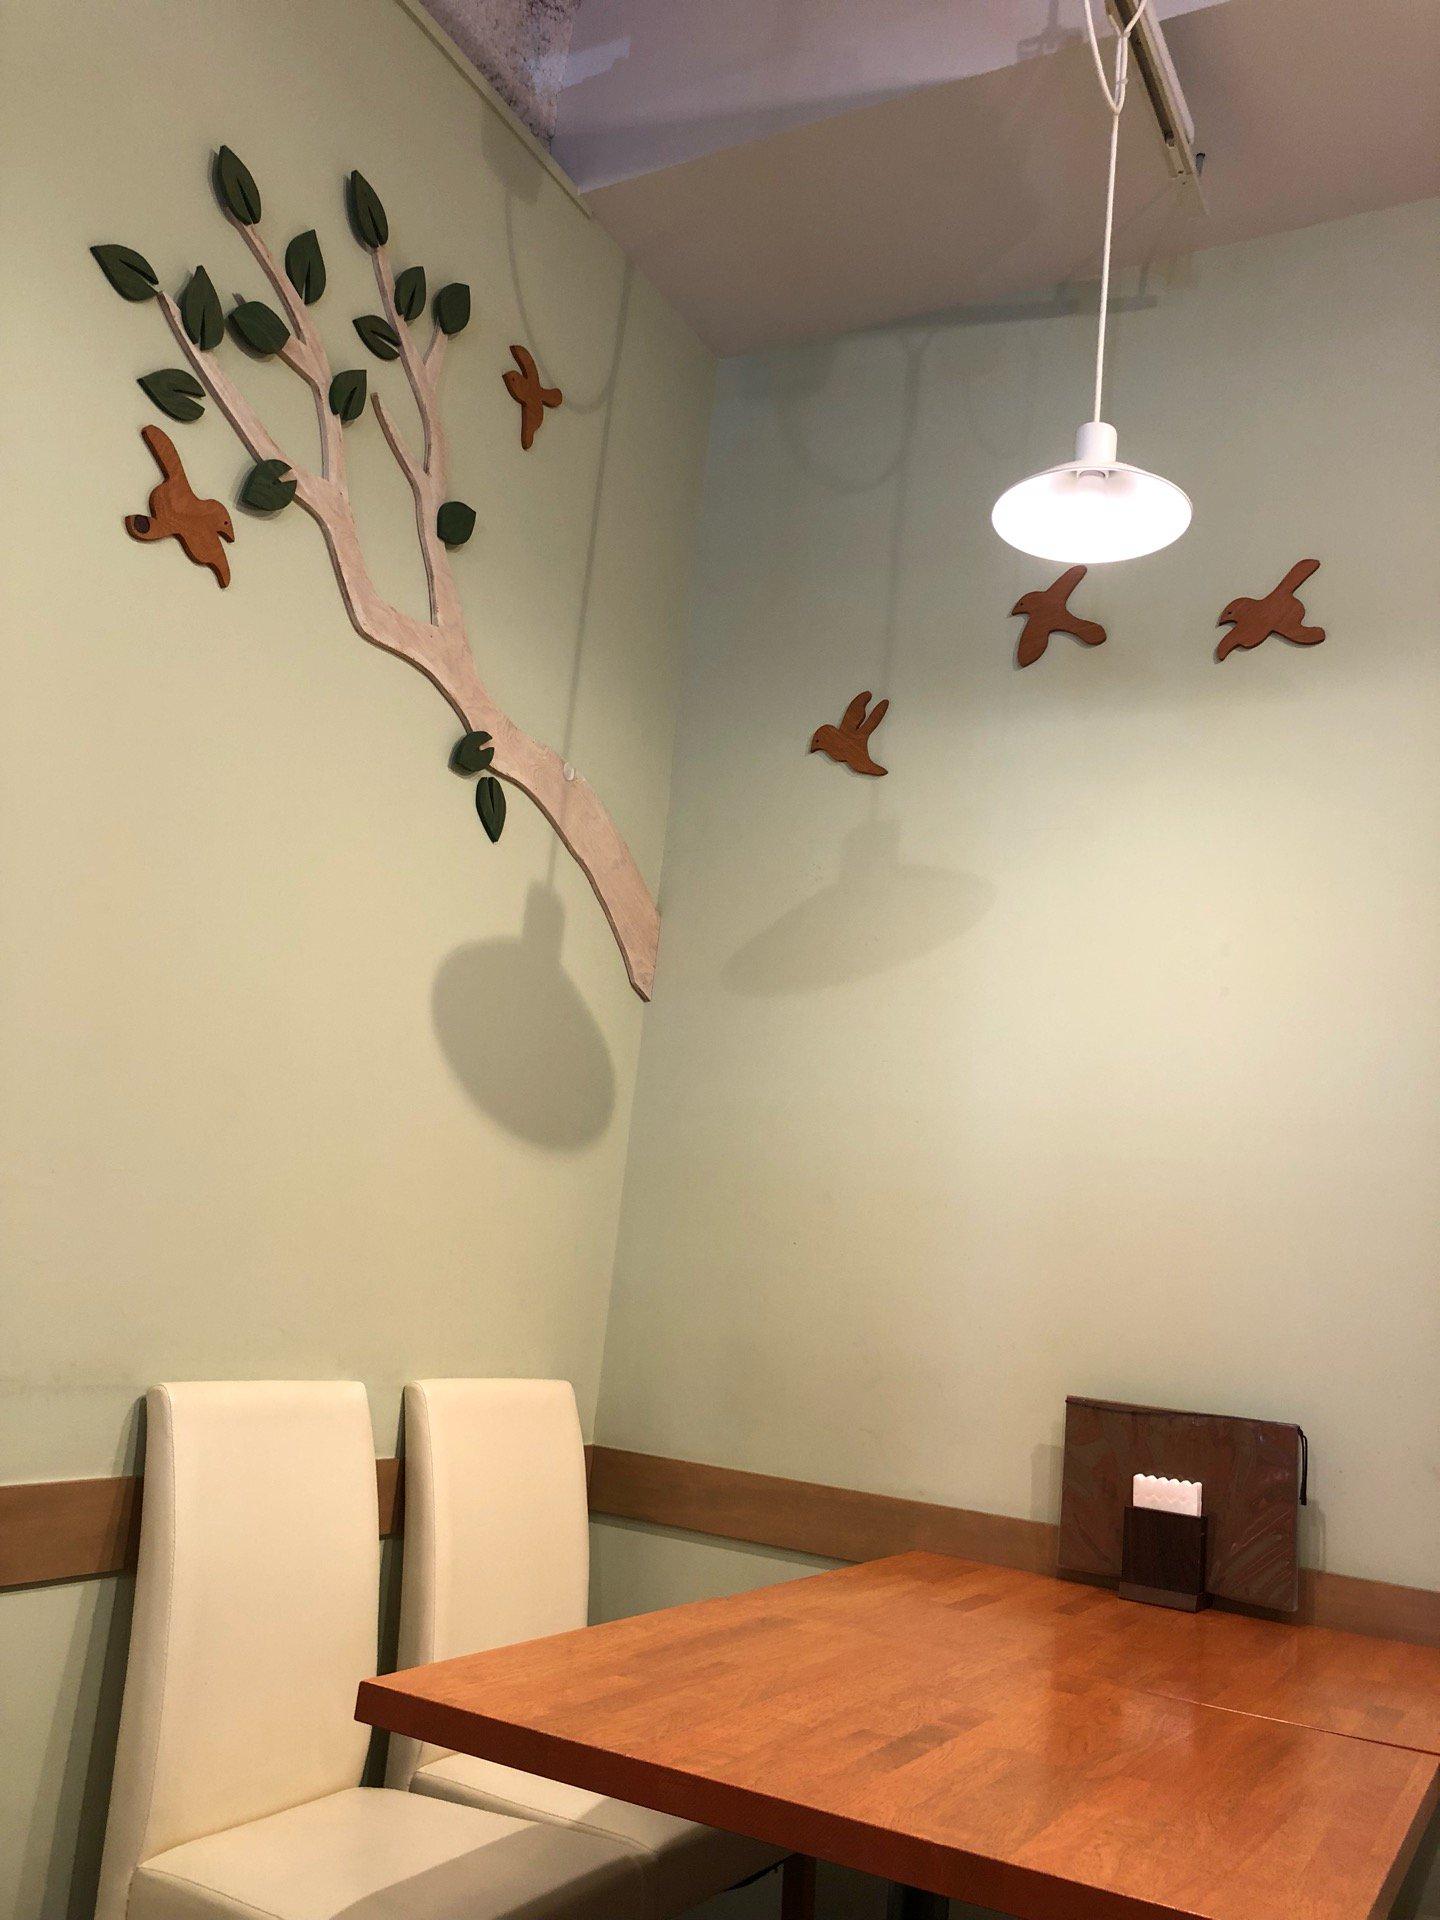 I'm at 天然酵母パン&カフェ いっぽ2 https://t.co/Mm7QmGXWkp https://t.co/eweh09CV4q